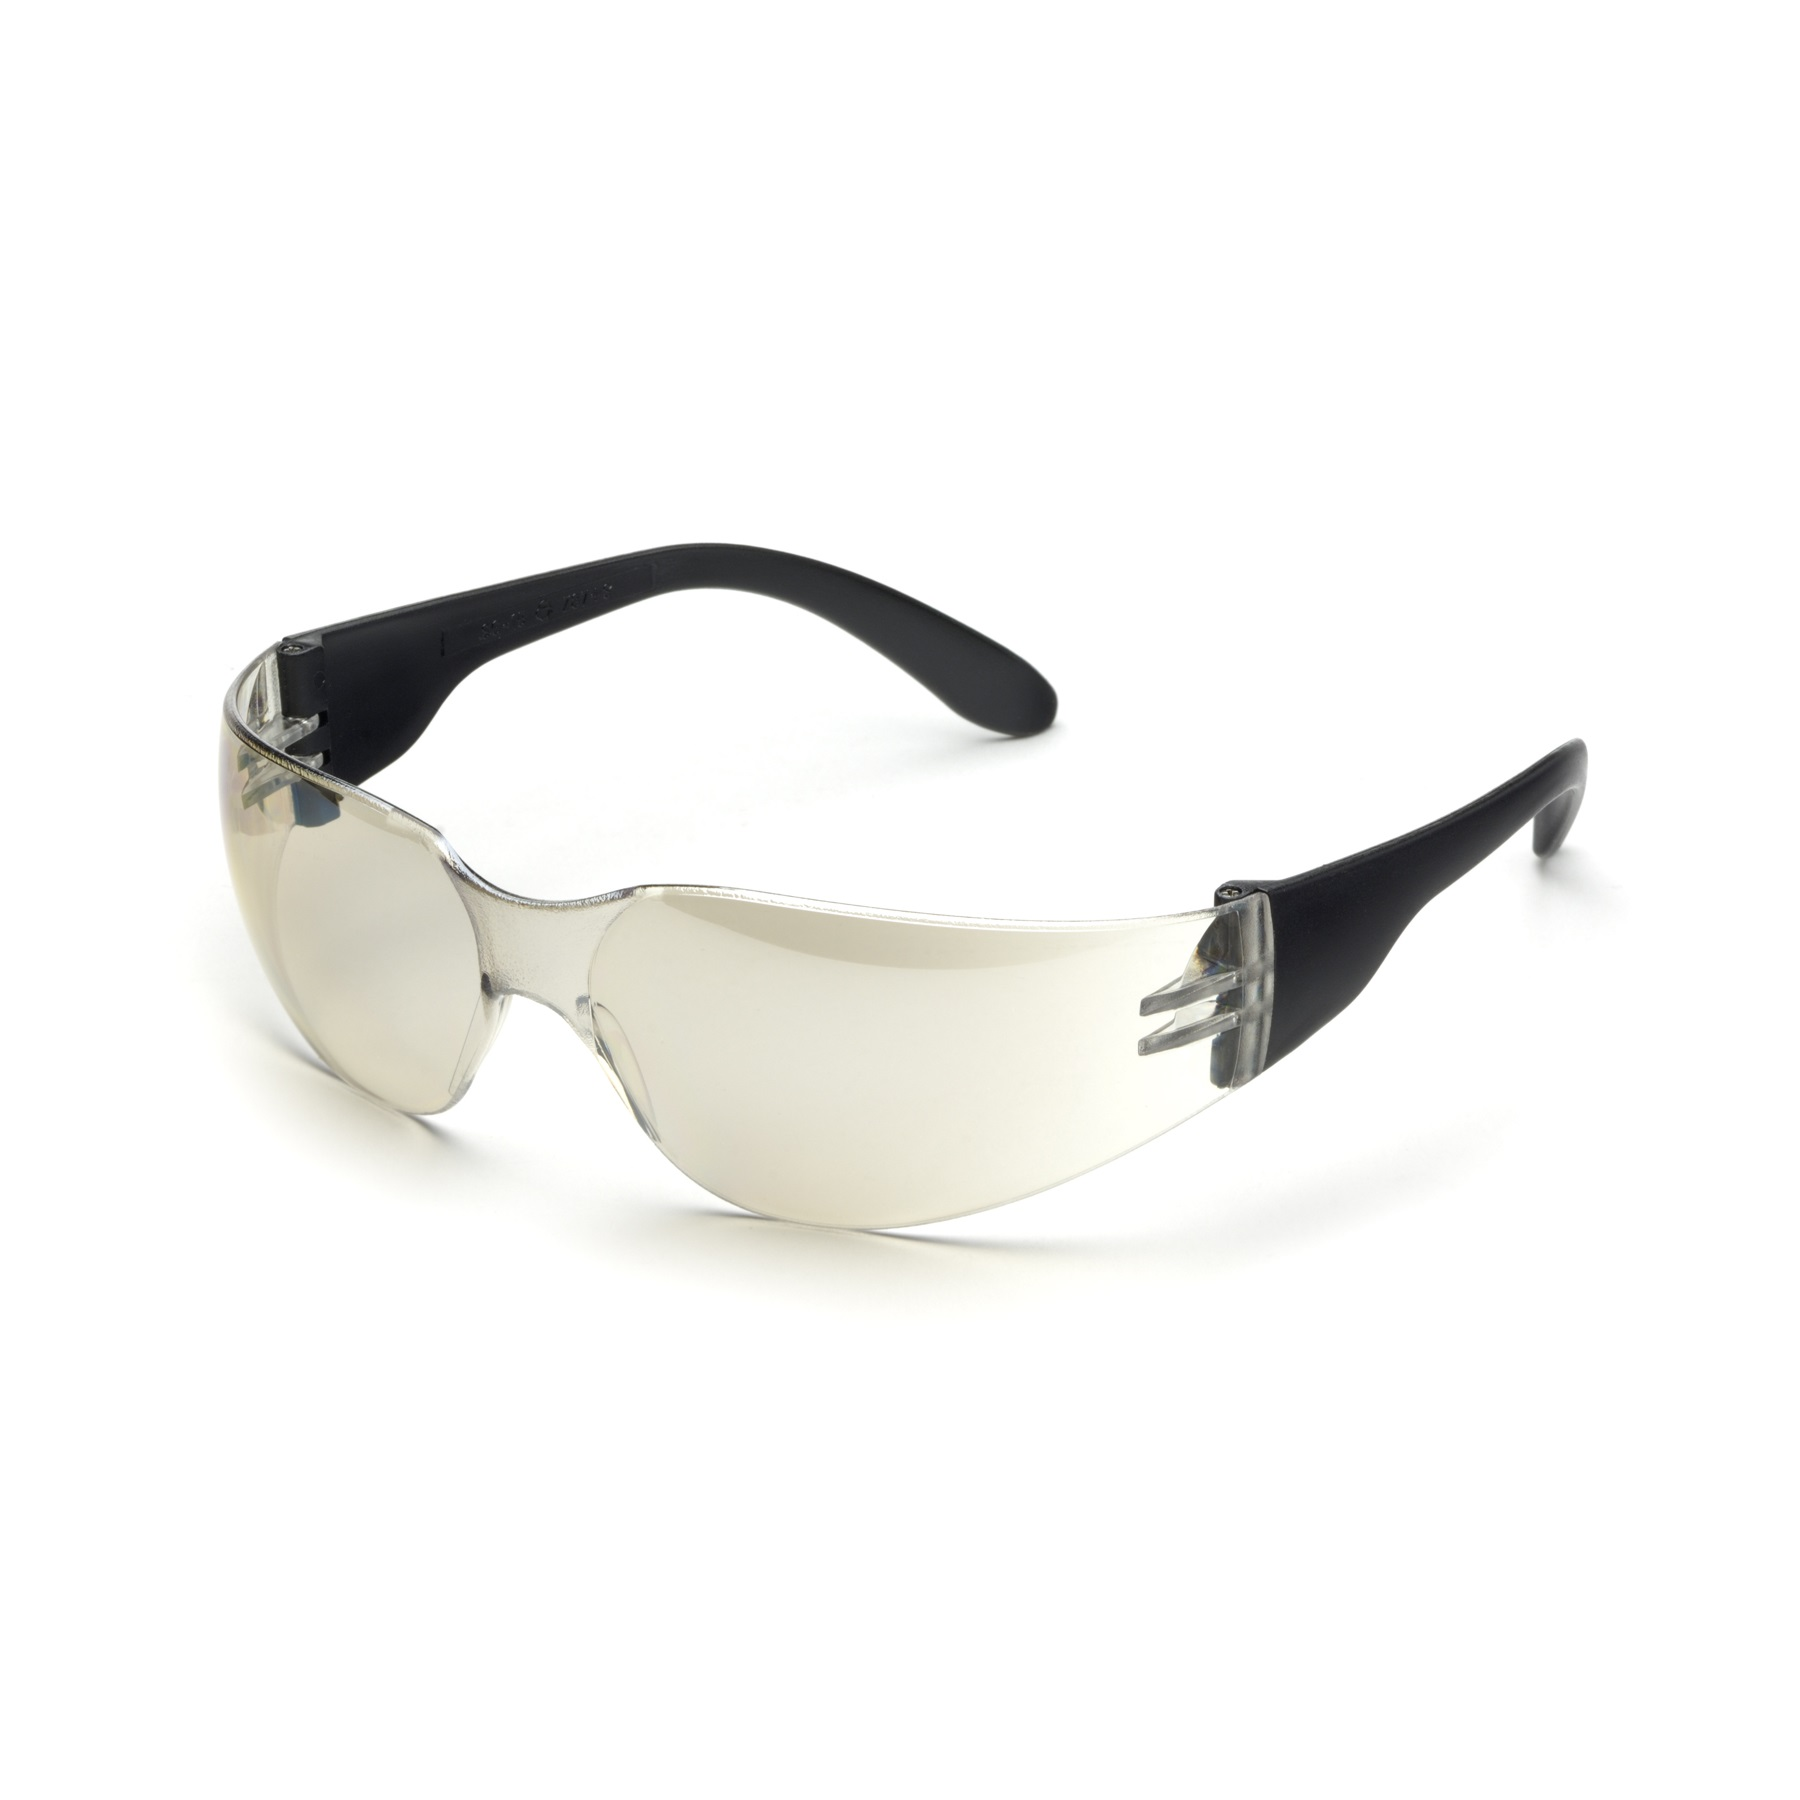 Elvex TTS Safety Glasses SG-15